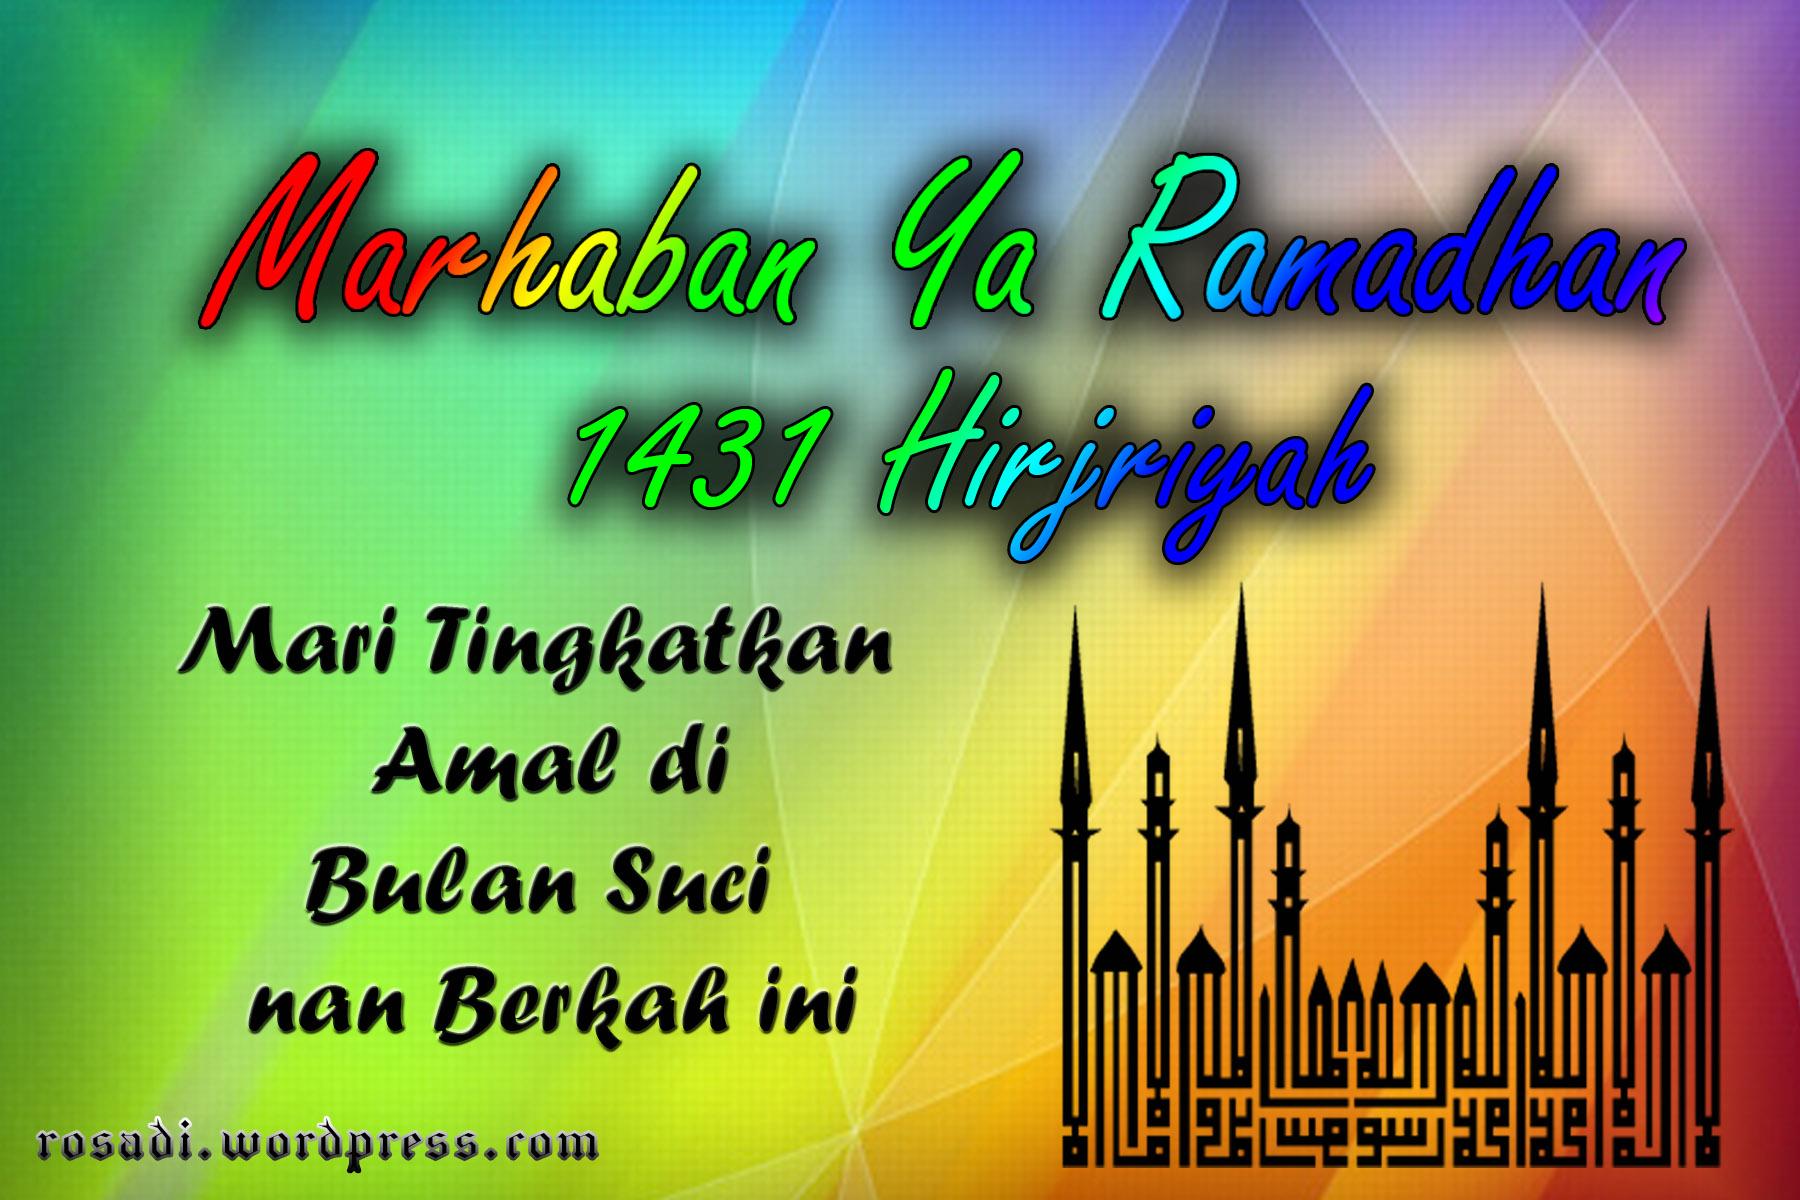 Bulan Suci Ramadhan 2018